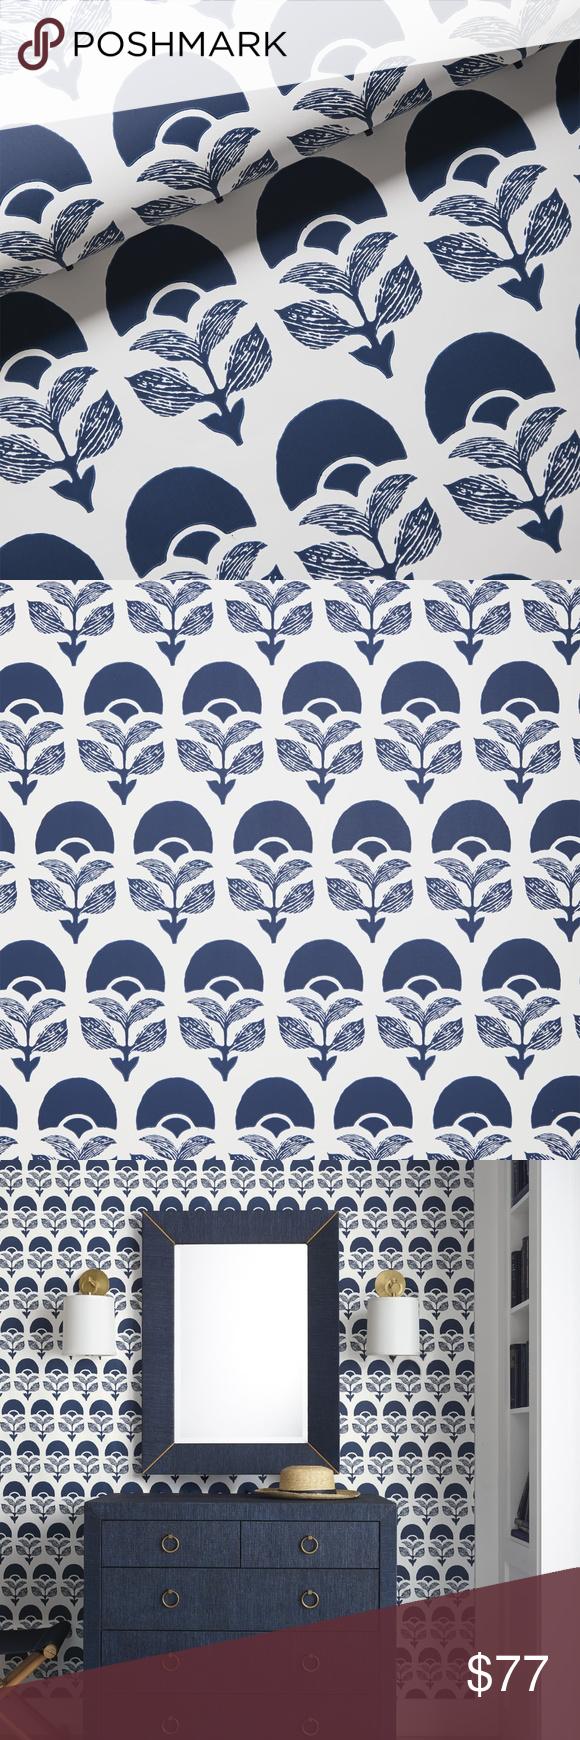 NEW Serena & Lily Larkspur Wallpaper Midnight Blue Retail